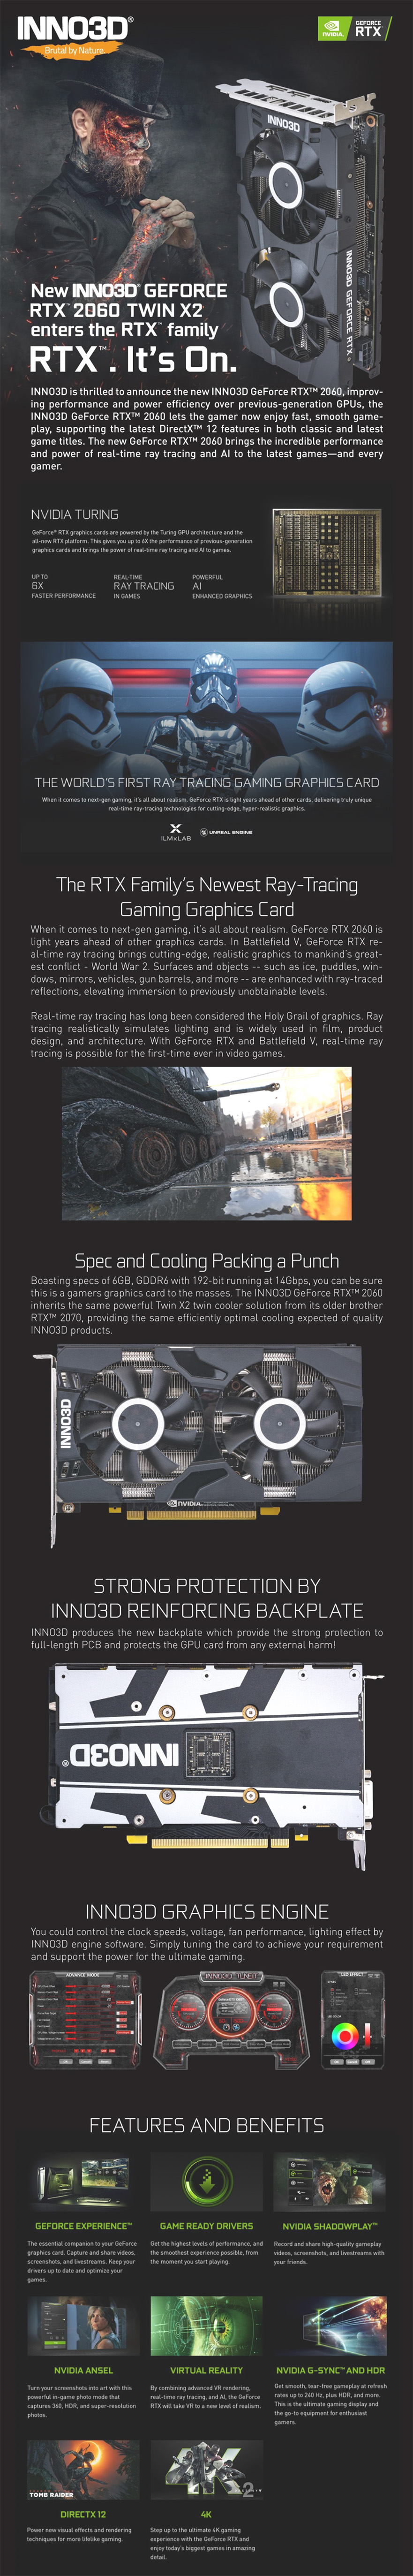 Inno3D GeForce RTX 2060 Twin X2 6G Graphics Card